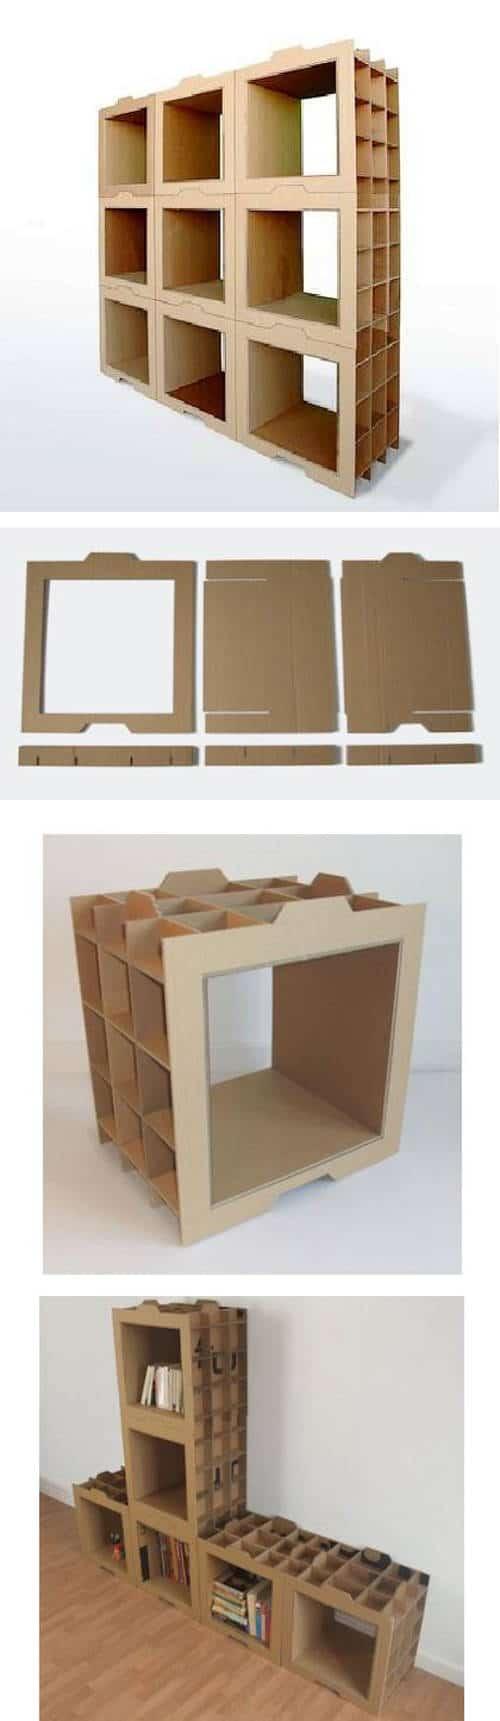 Muebles de cartón, hazlo tu mismo  Taringa!